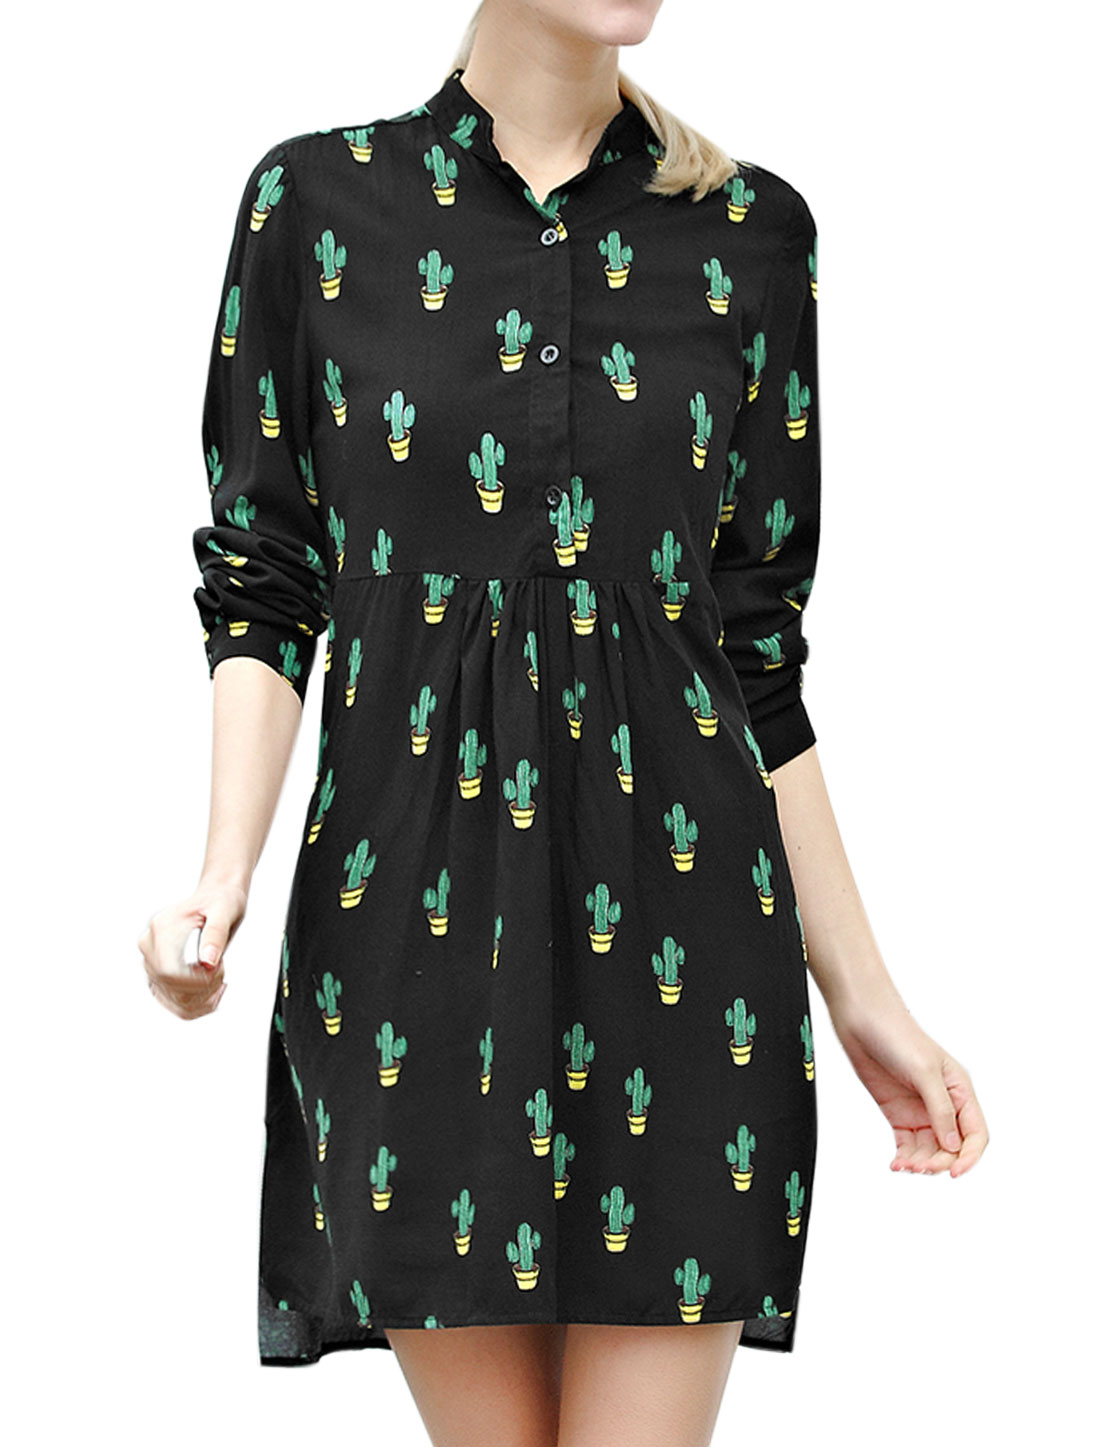 Women Half Button Closure Cactus Print Tunic Dress Black L